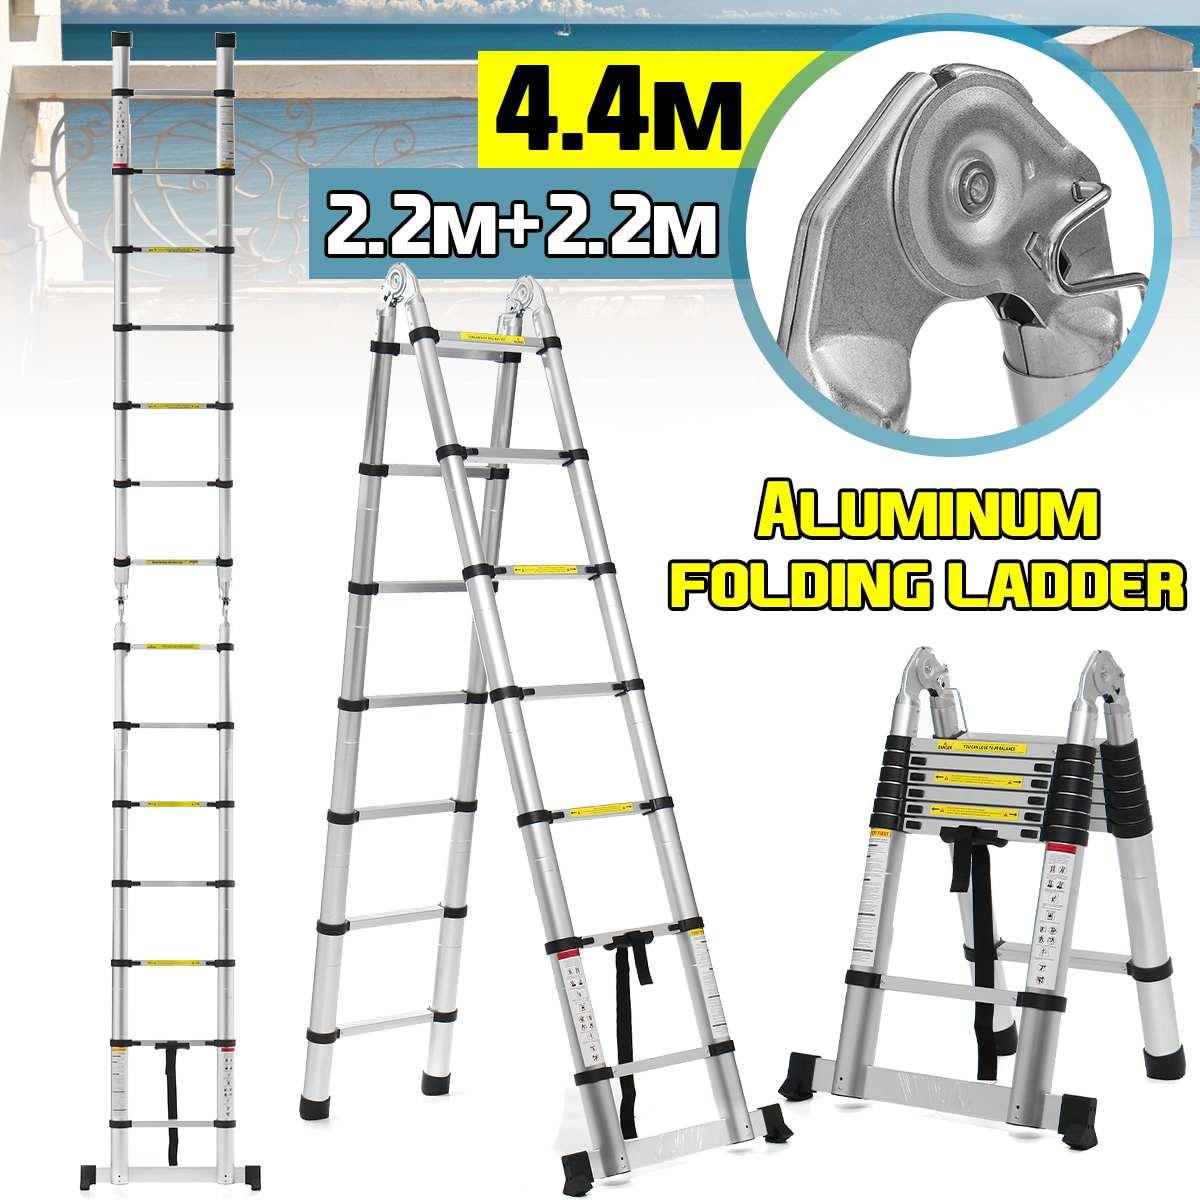 2.2m+2.2m 14.5Ft Folding Ladder Telescopic Ladders Aluminium Dual-Use Herringbone Ladder Multifunctional Single Extension Tools